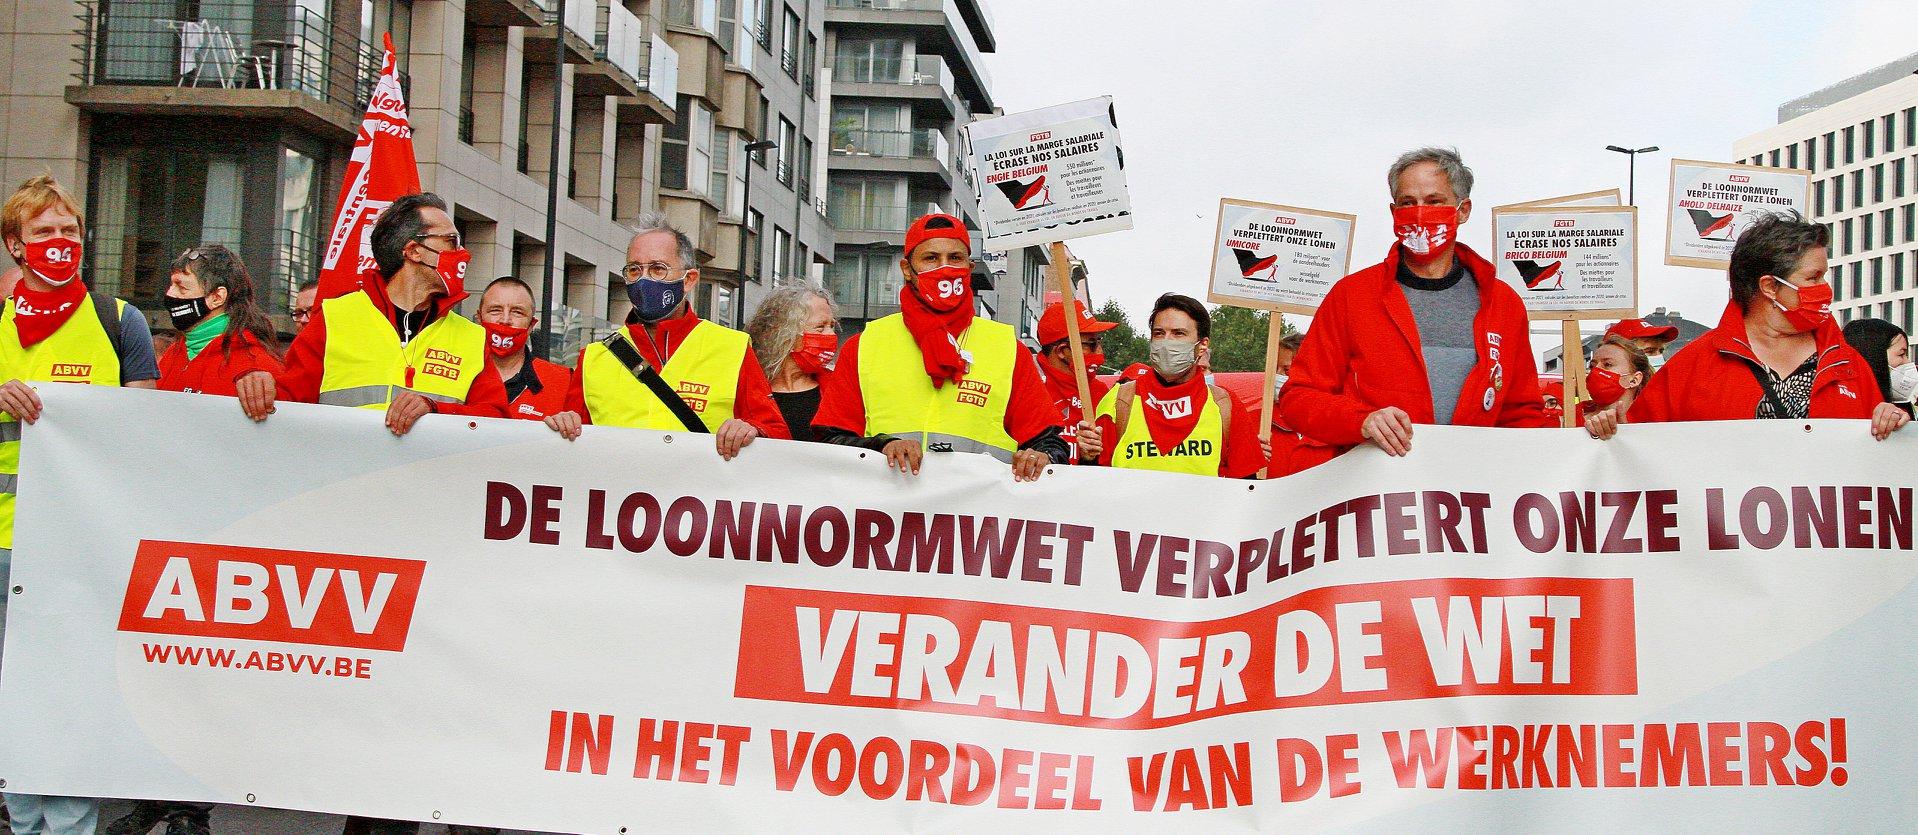 15.000 betogers : Breek de loonnorm, breek de loonwet!